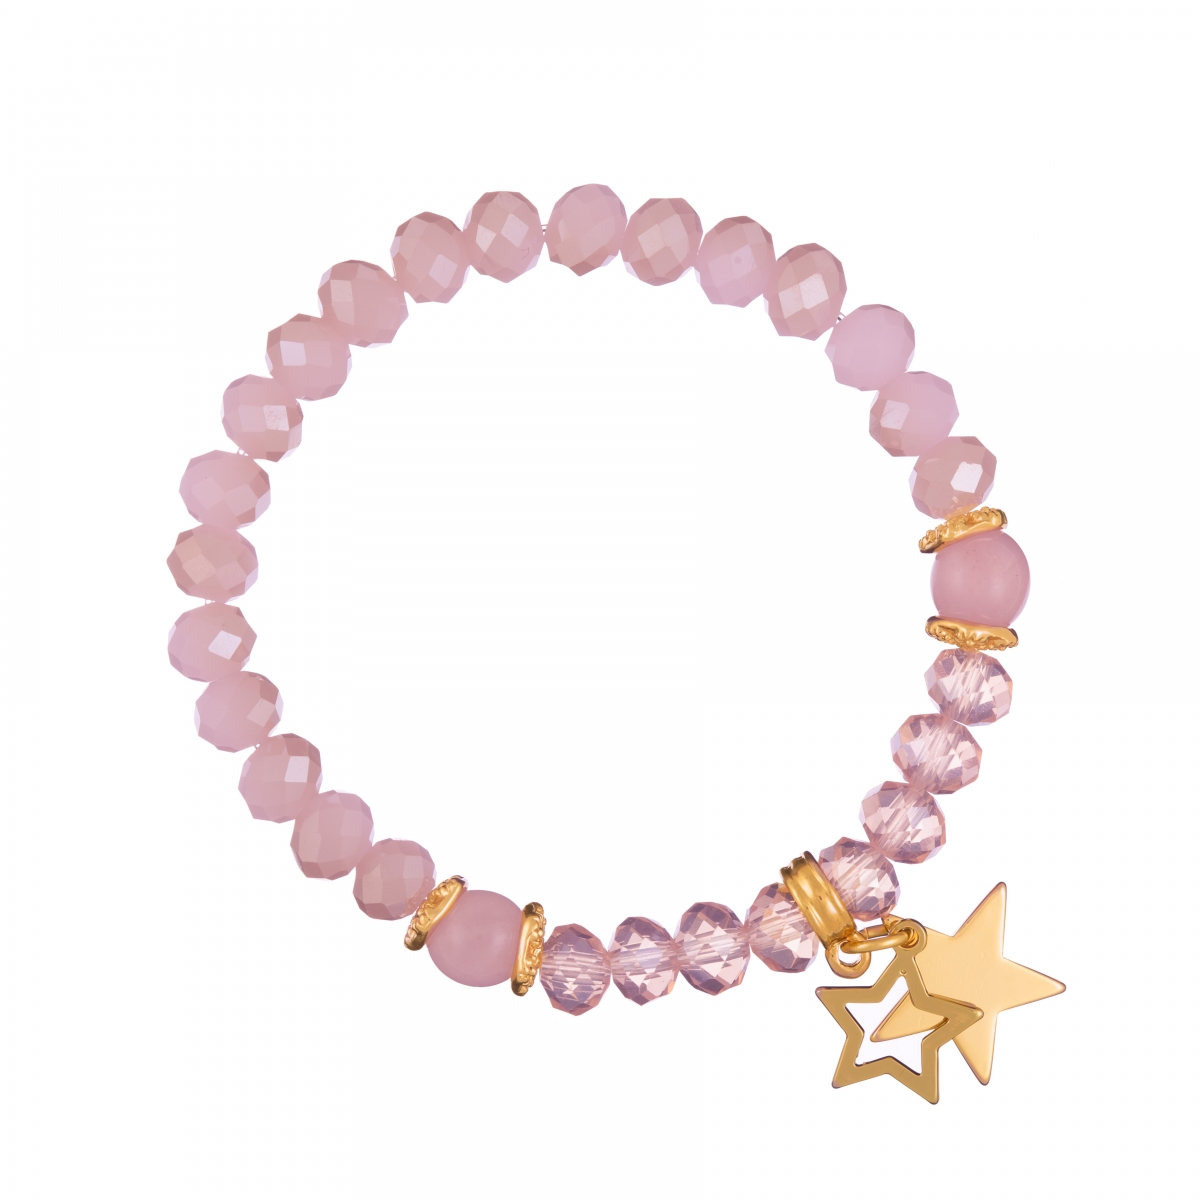 Náramok Mineral Solid Pink Jadeit Gold Stars